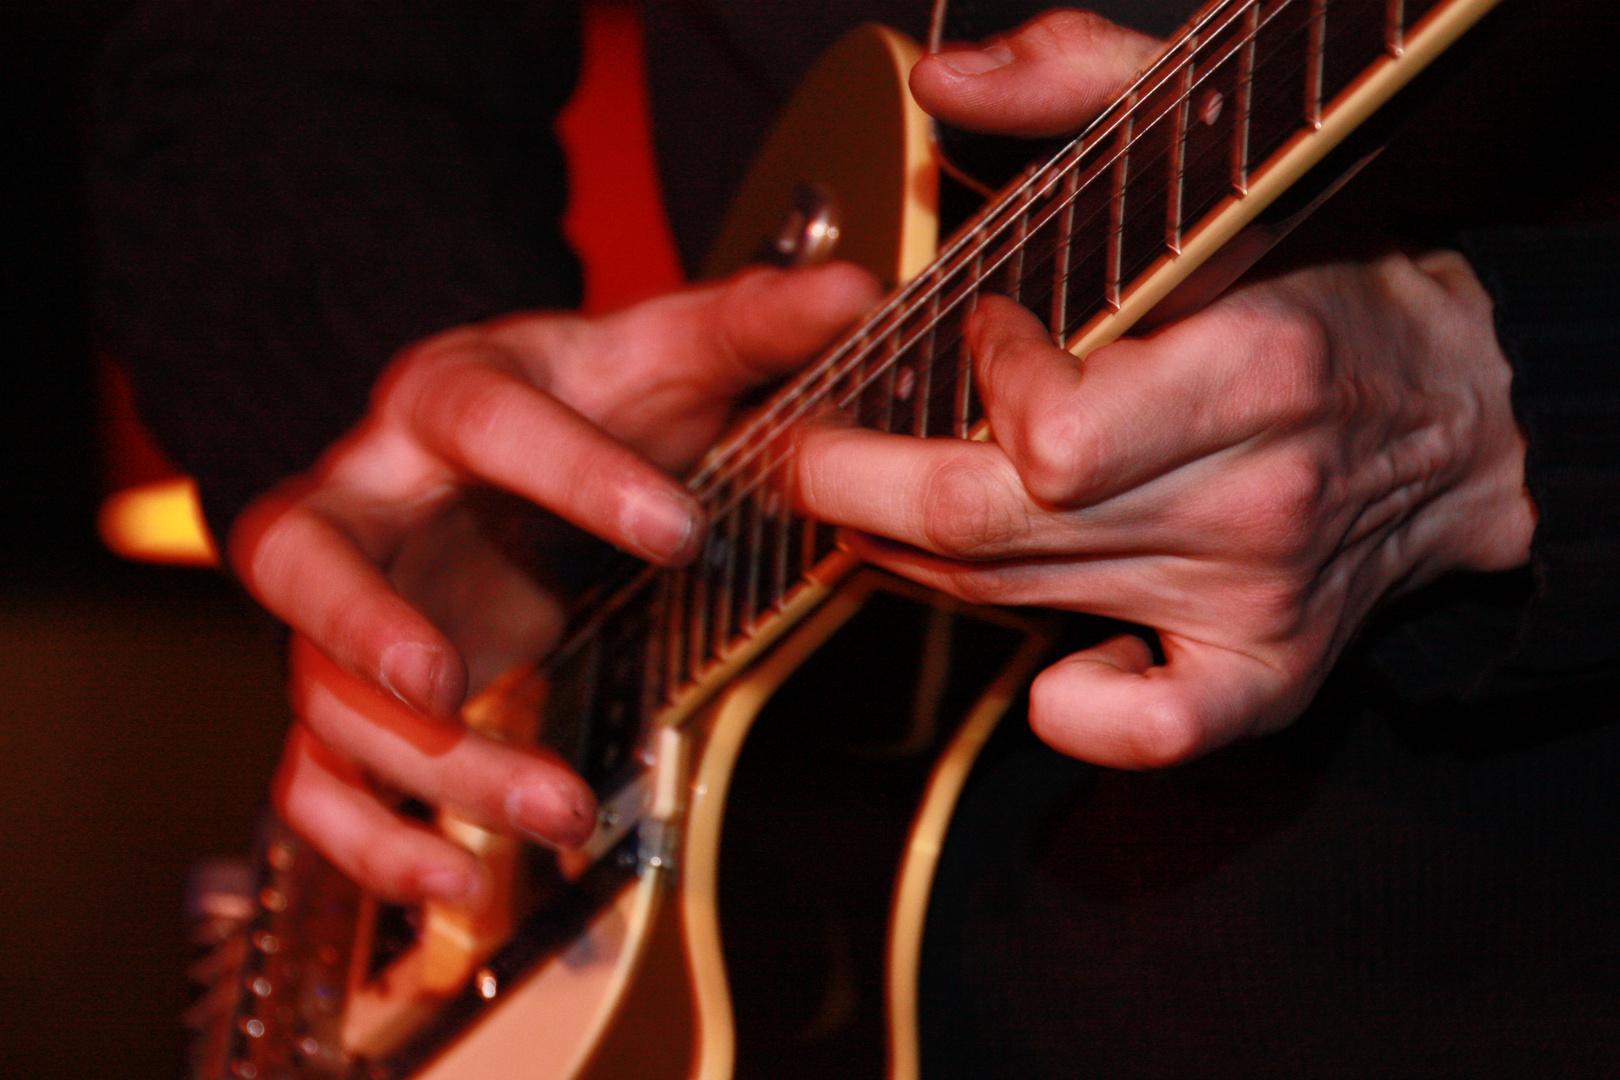 Gitarrenhände